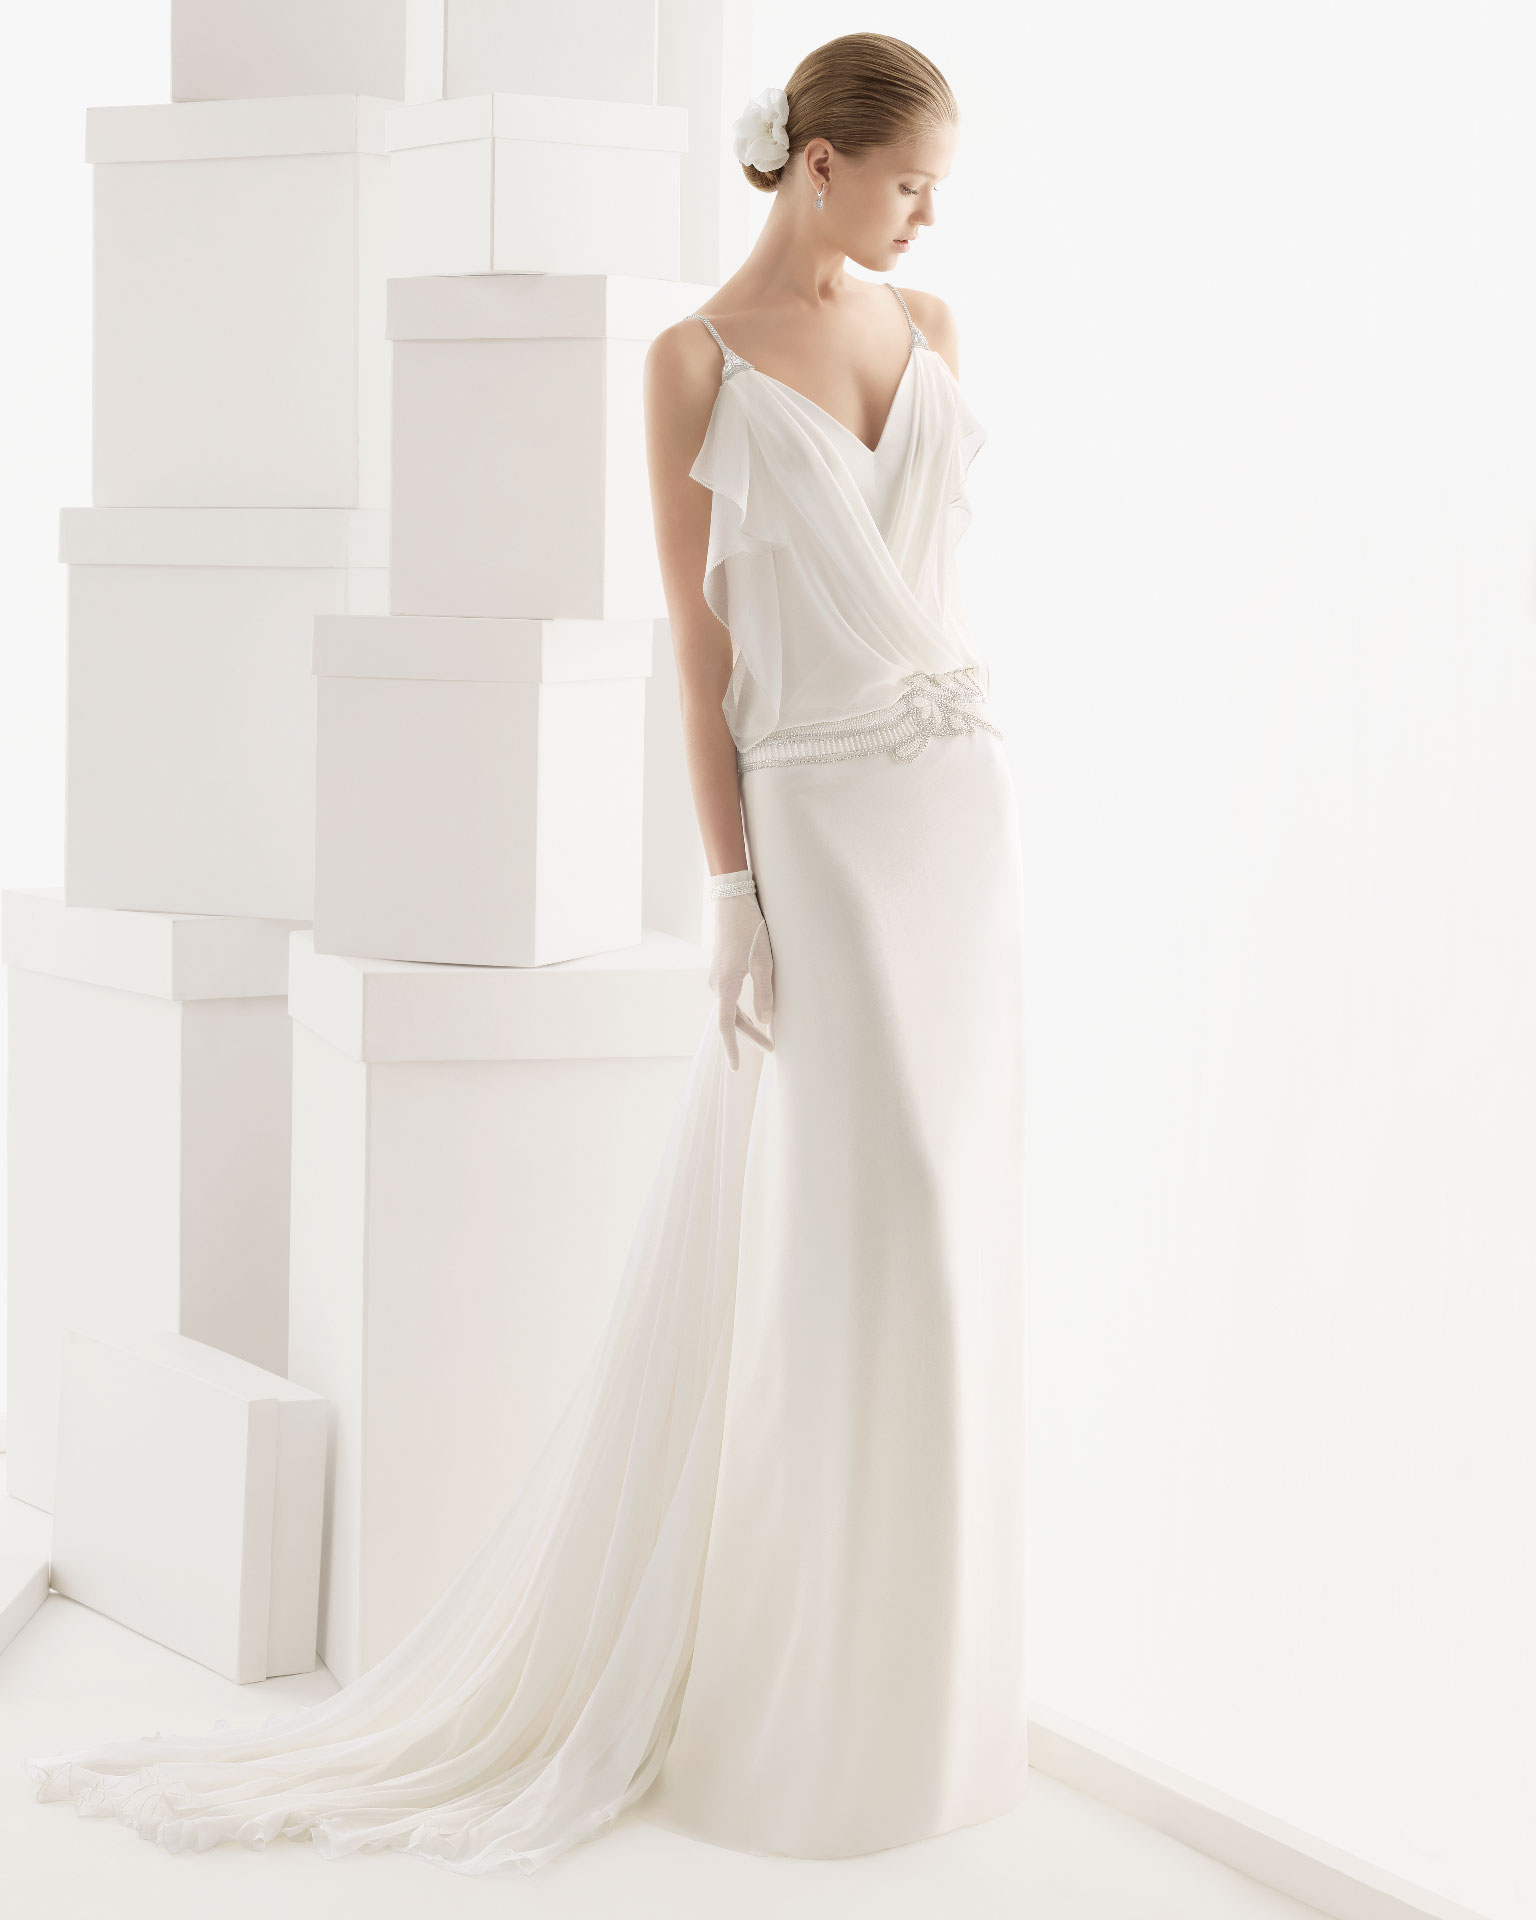 Rosa clara wedding dress 2014 bridal ciclamen for Rosa clara wedding dresses 2014